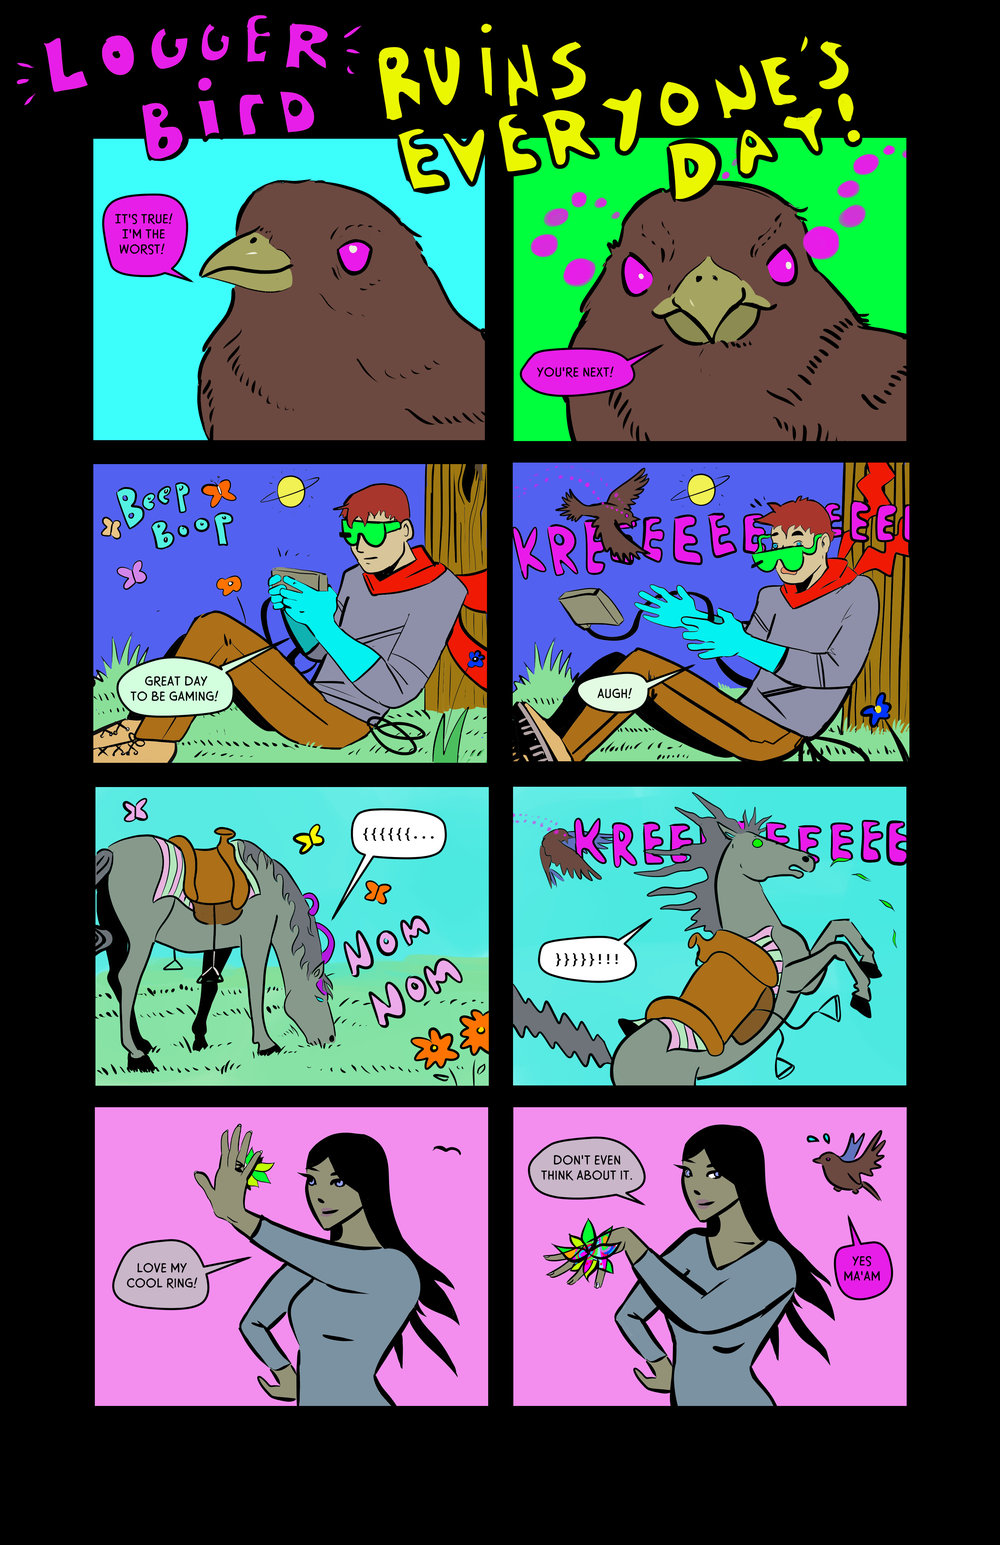 logger bird ruins everything - tilted sun bonus comic becky jewell.jpg